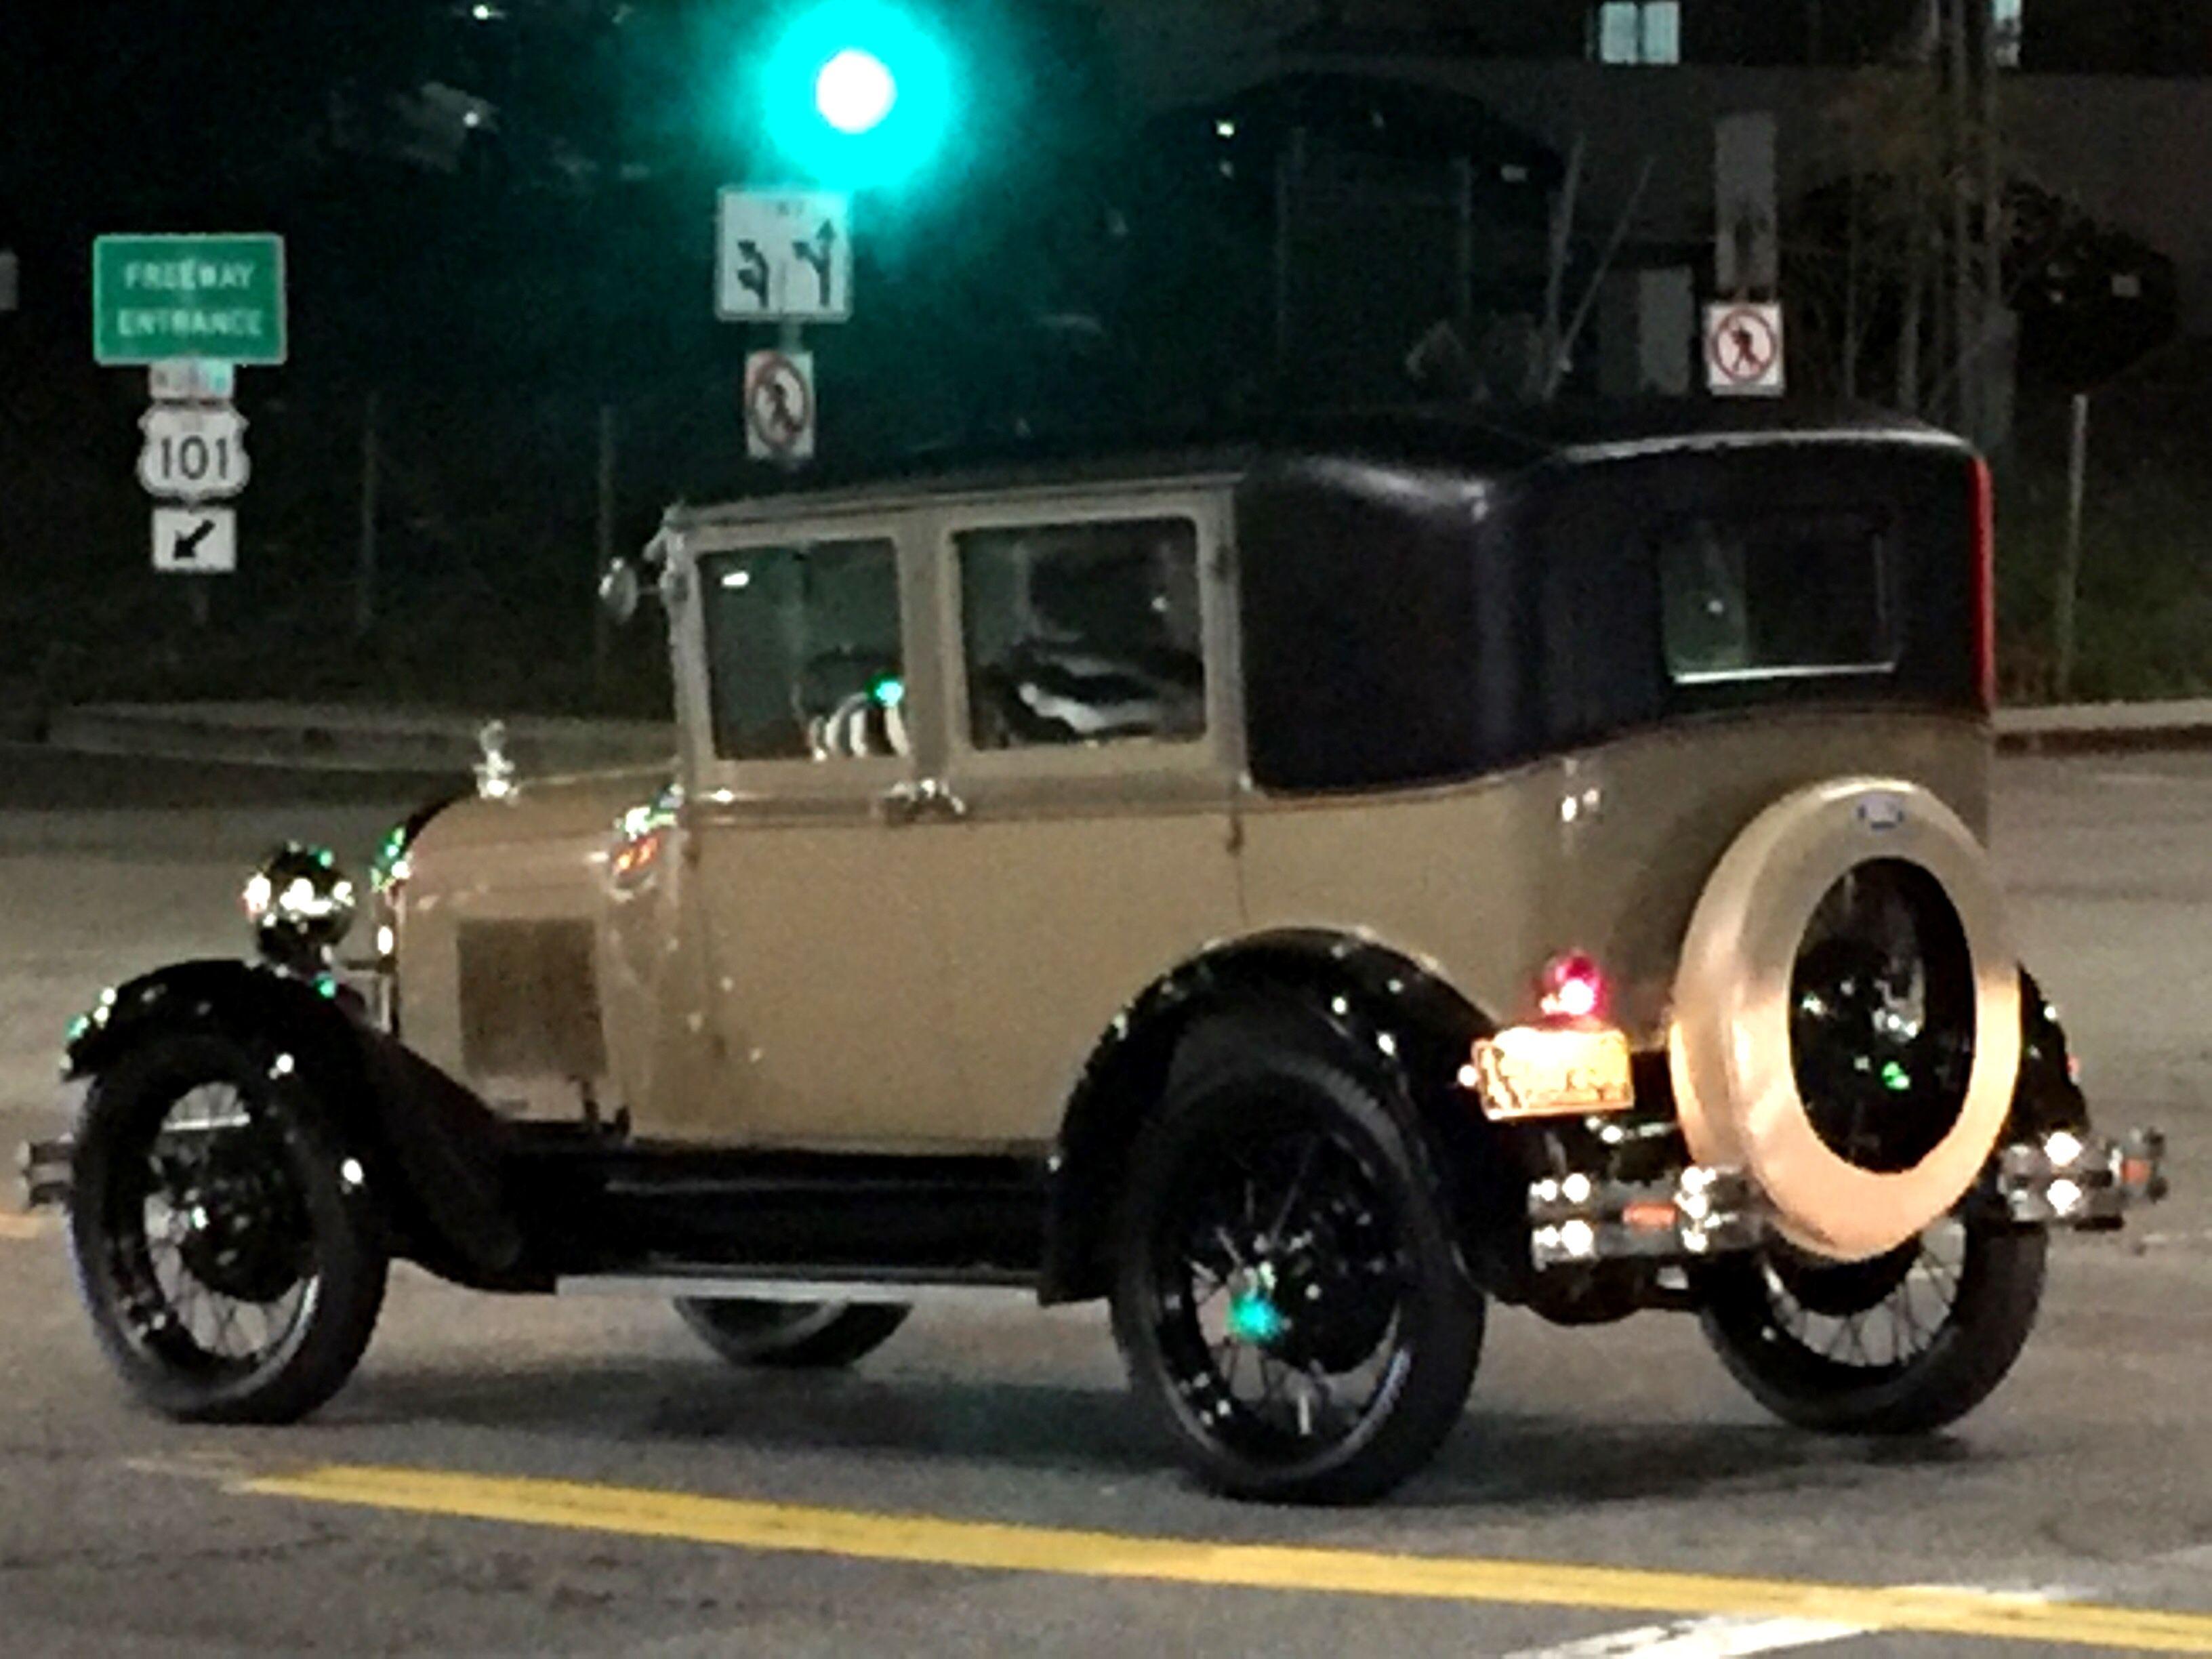 Model T Ford 1927 Argyle at Franklin Hollywood